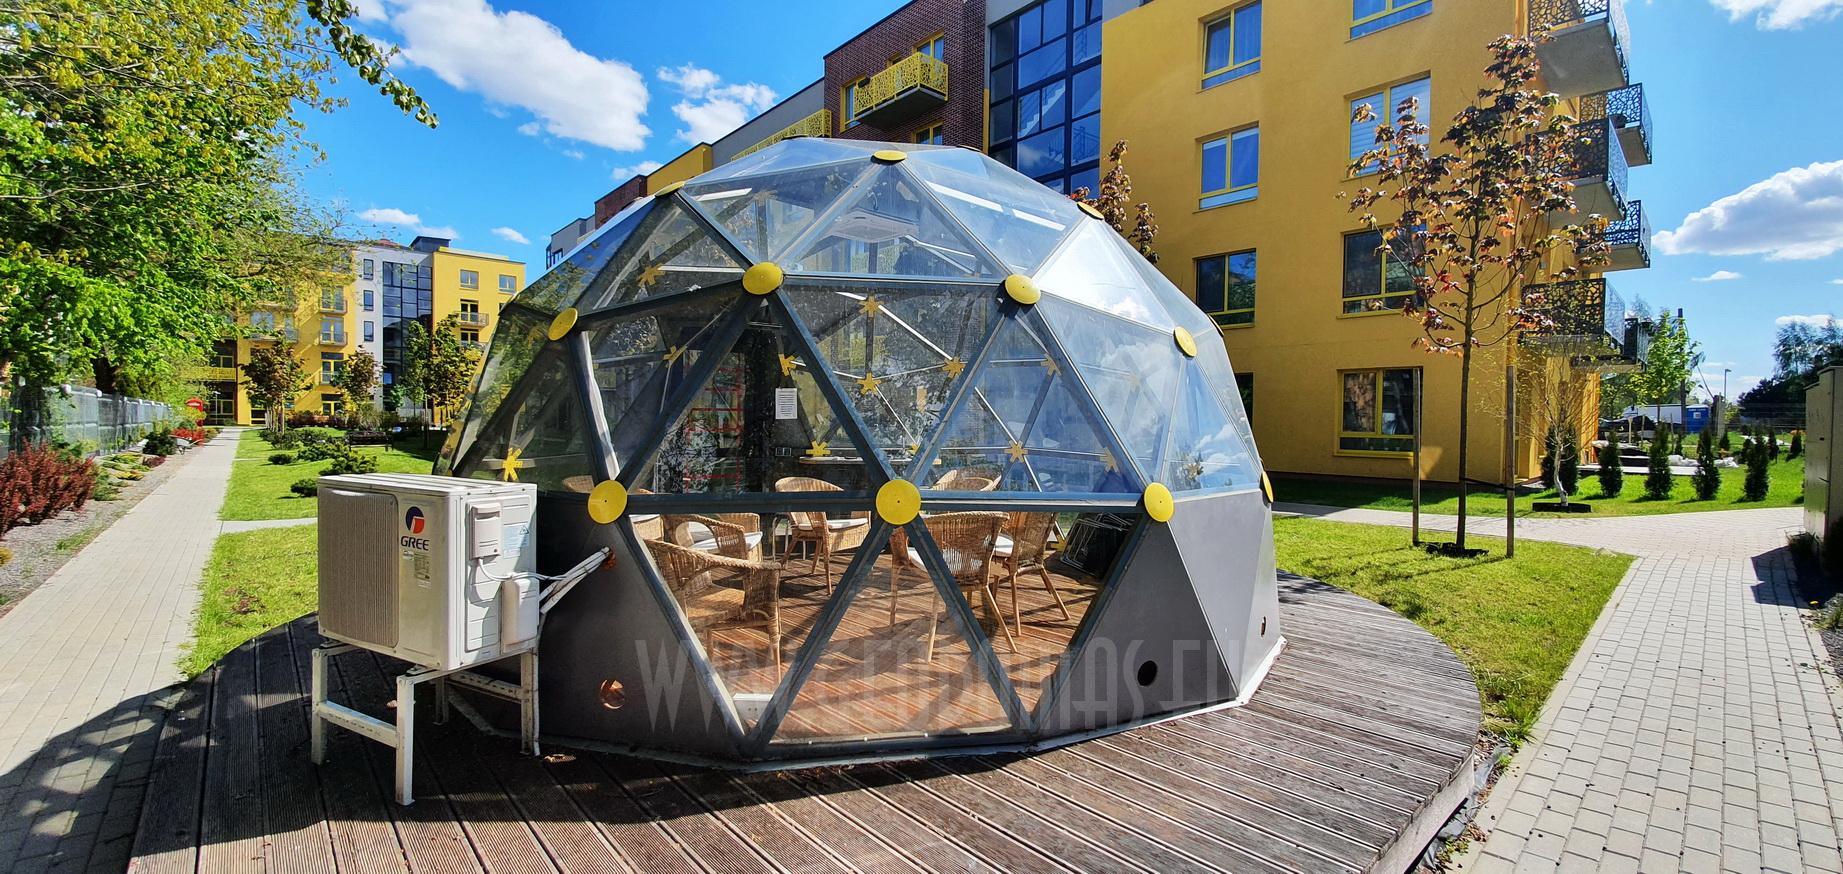 20m2 Public Lounge Dome   Fontanu Namai, Vilnius